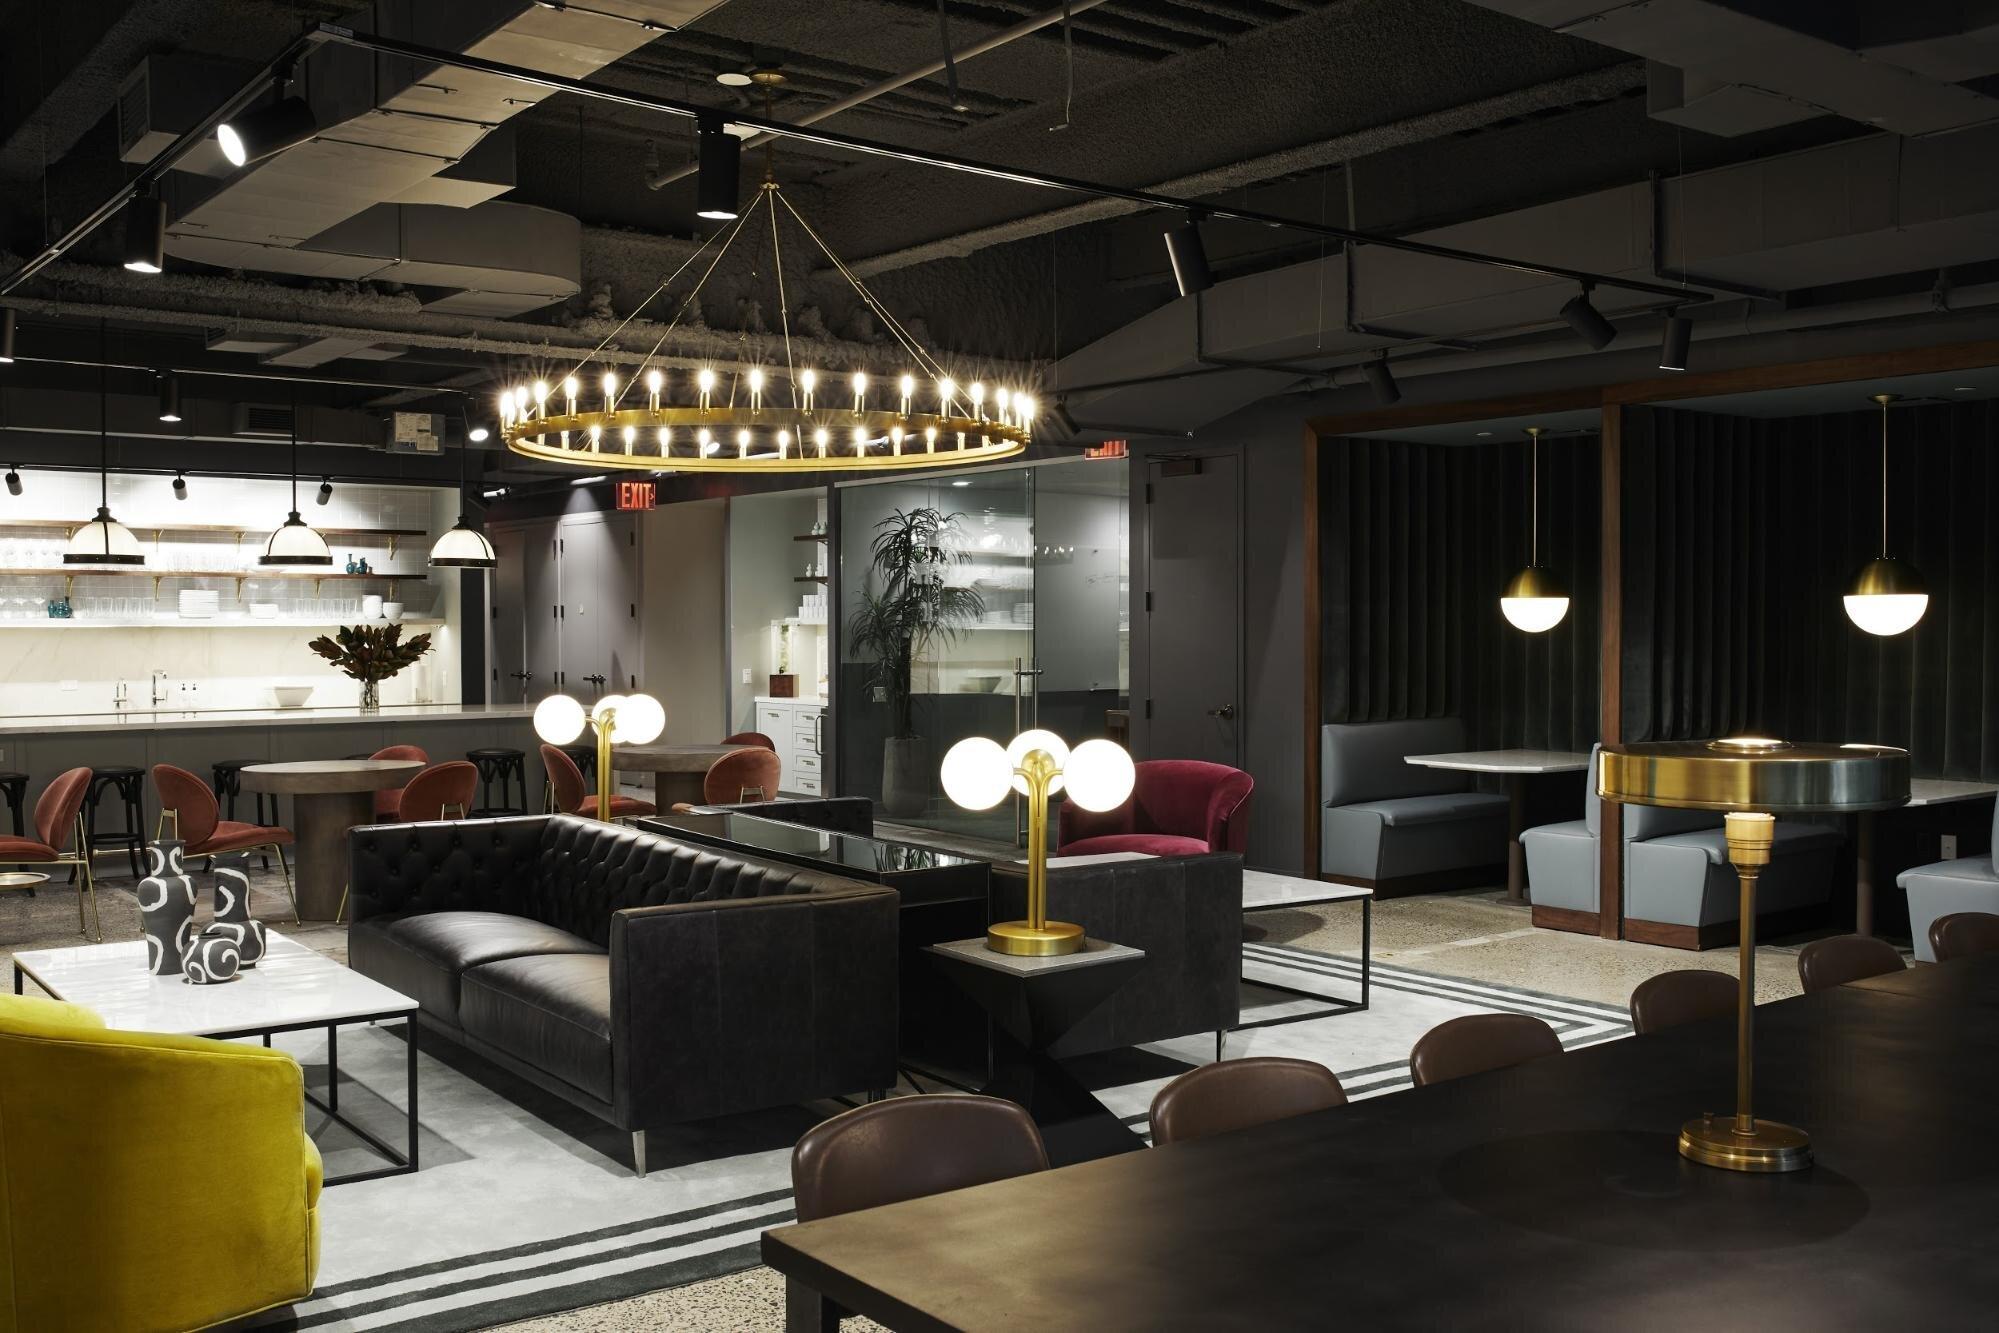 Inside decor of a flexible workspace